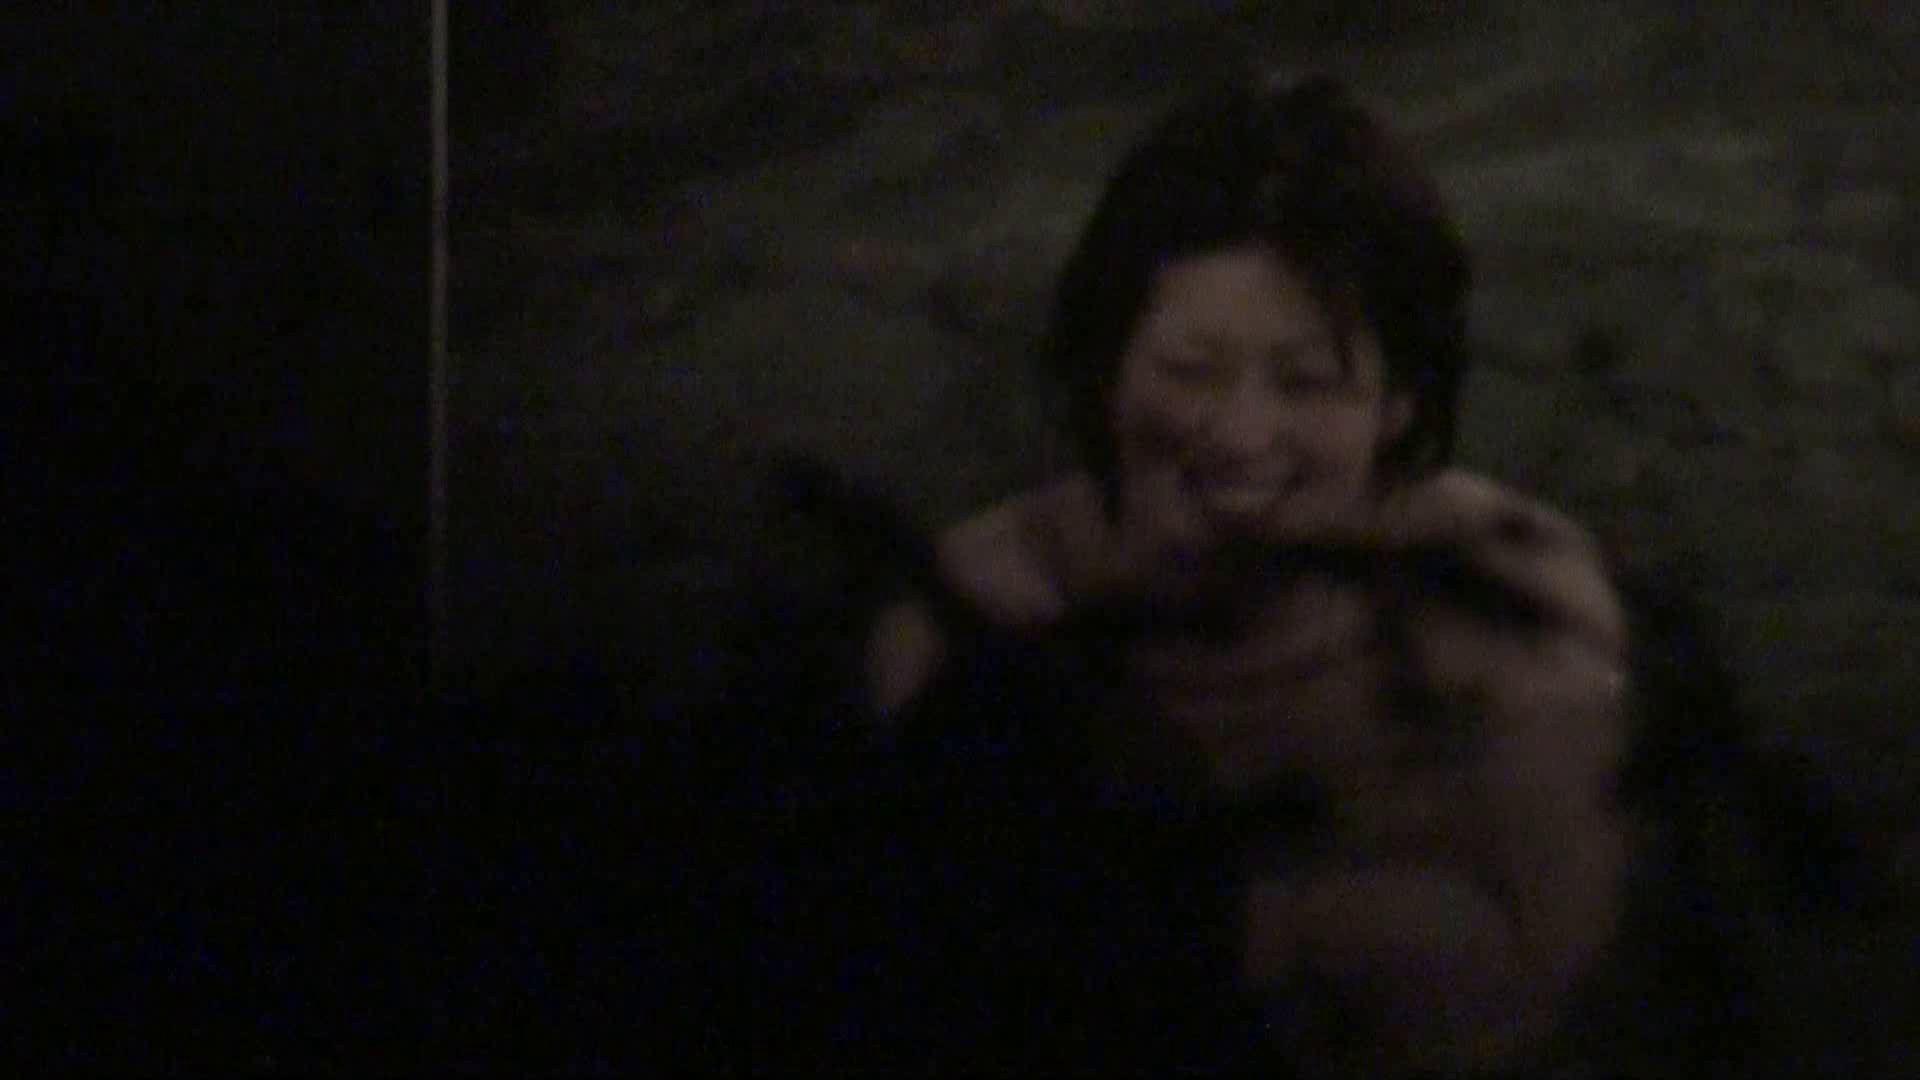 Aquaな露天風呂Vol.376 いやらしいOL われめAV動画紹介 33連発 12